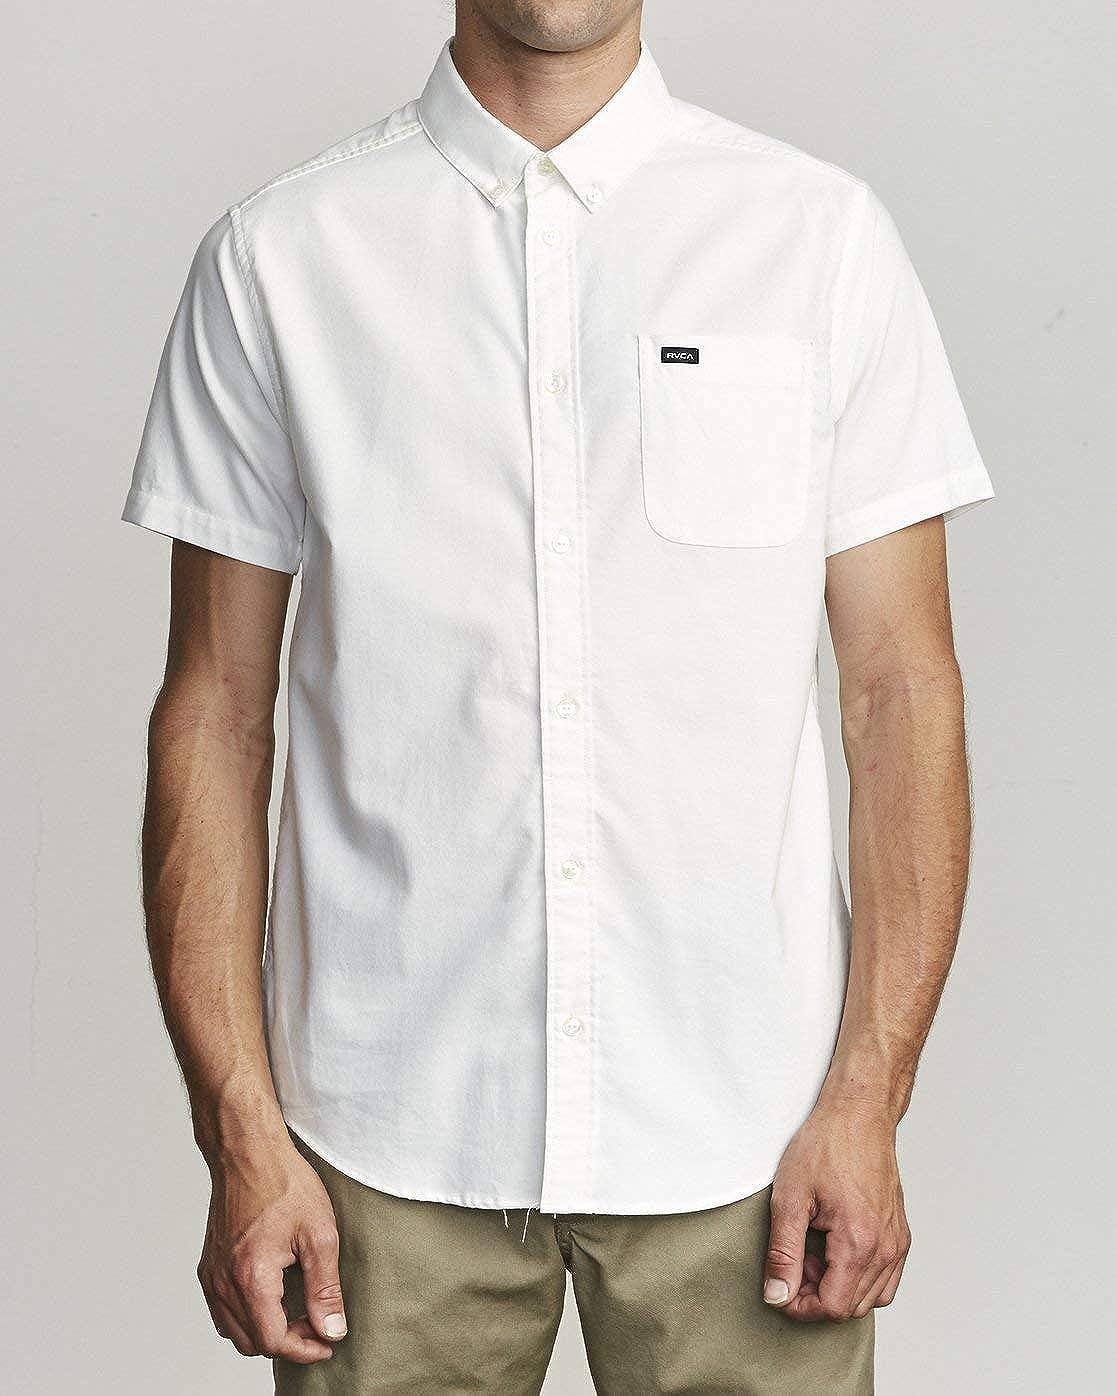 RVCA Men's That'll Do Stretch Button-Up Shirt